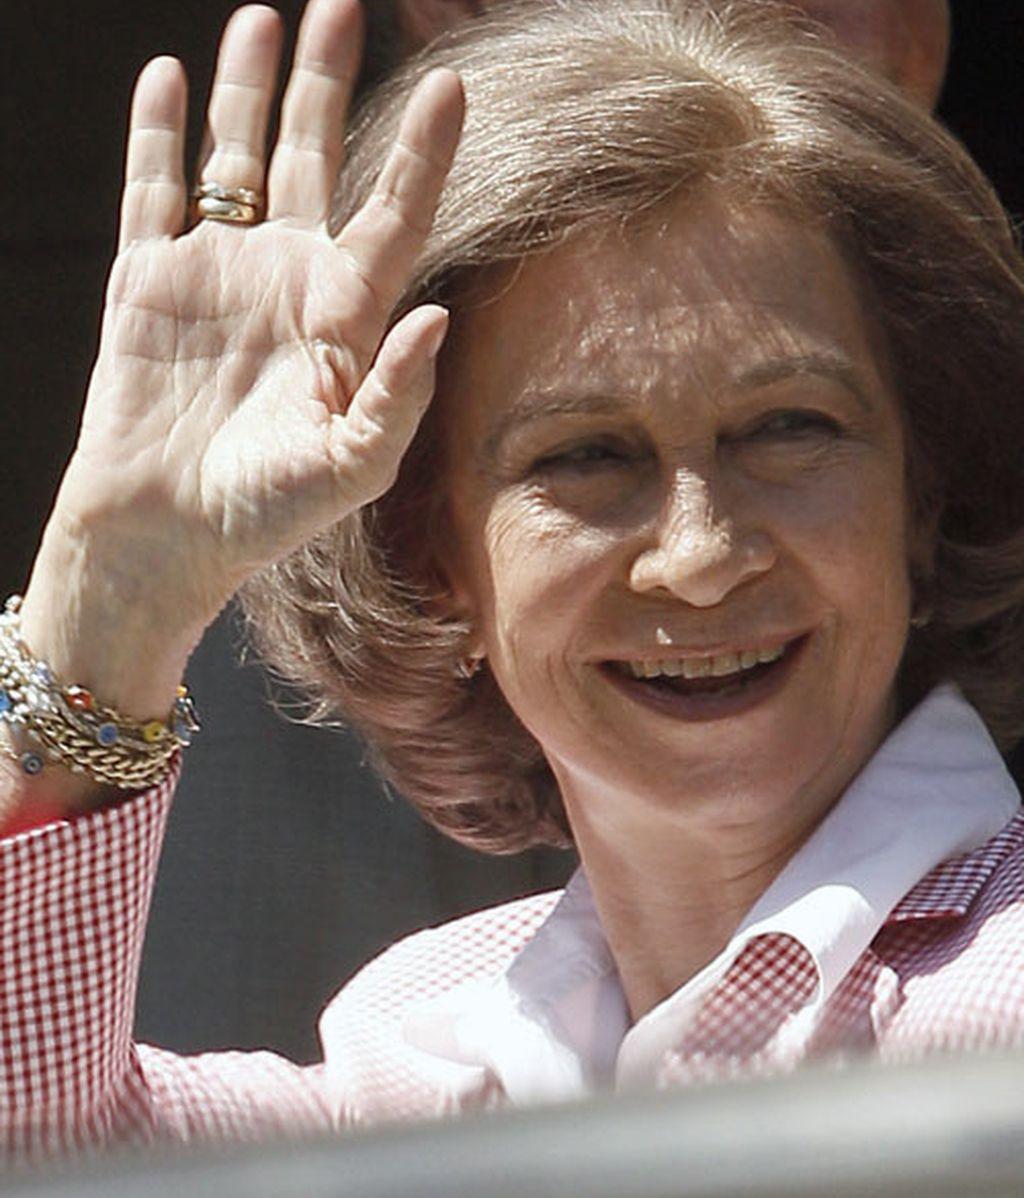 La reina Sofía a su llegada al hospital